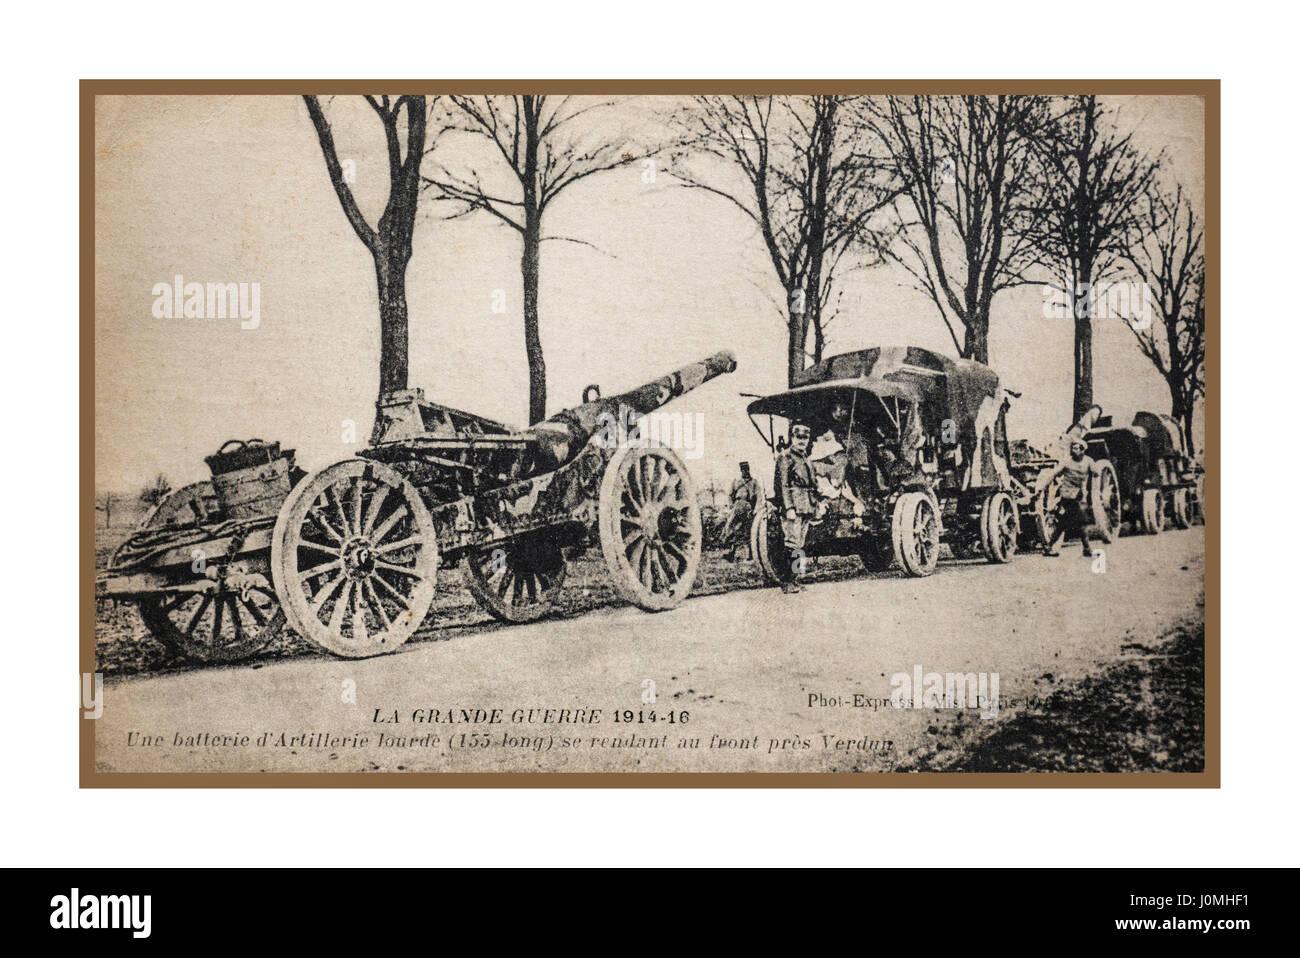 Verdun France supply line of guns and ammunition Poignant vintage historic WW1 1914 postcard, sent from the battle - Stock Image